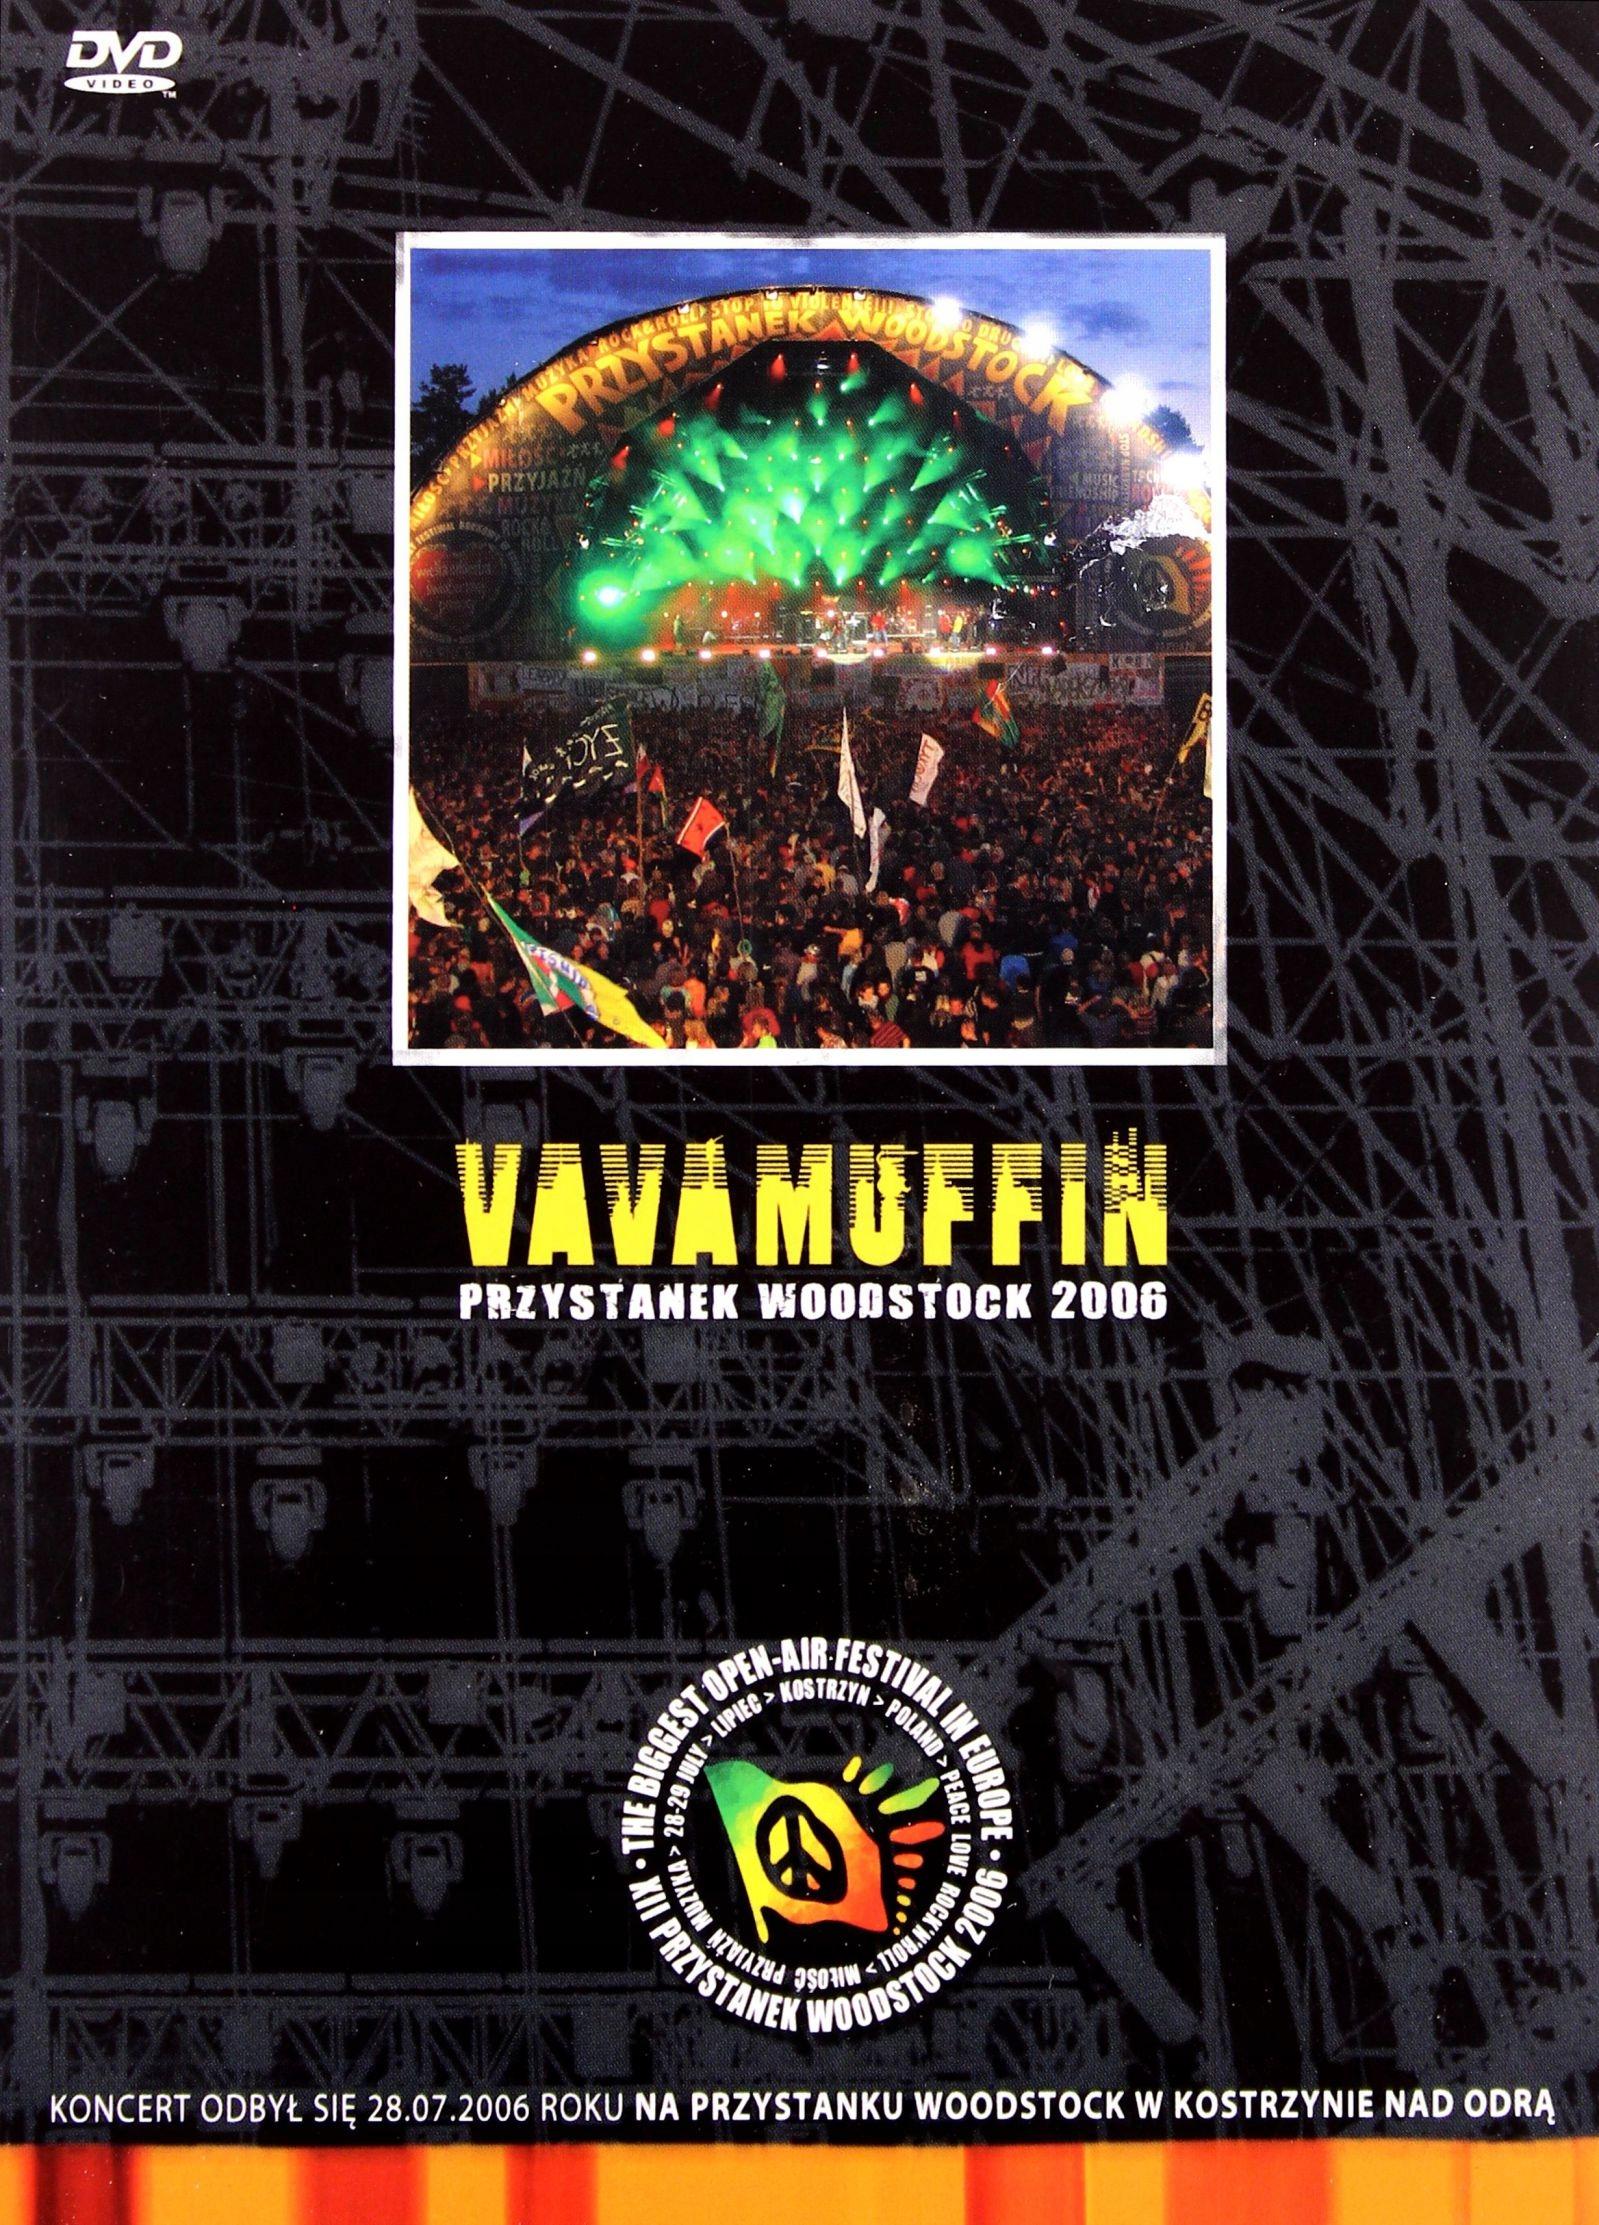 VAVAMUFFIN: PRZYSTANEK WOODSTOCK 2006 (DIGIPACK) D